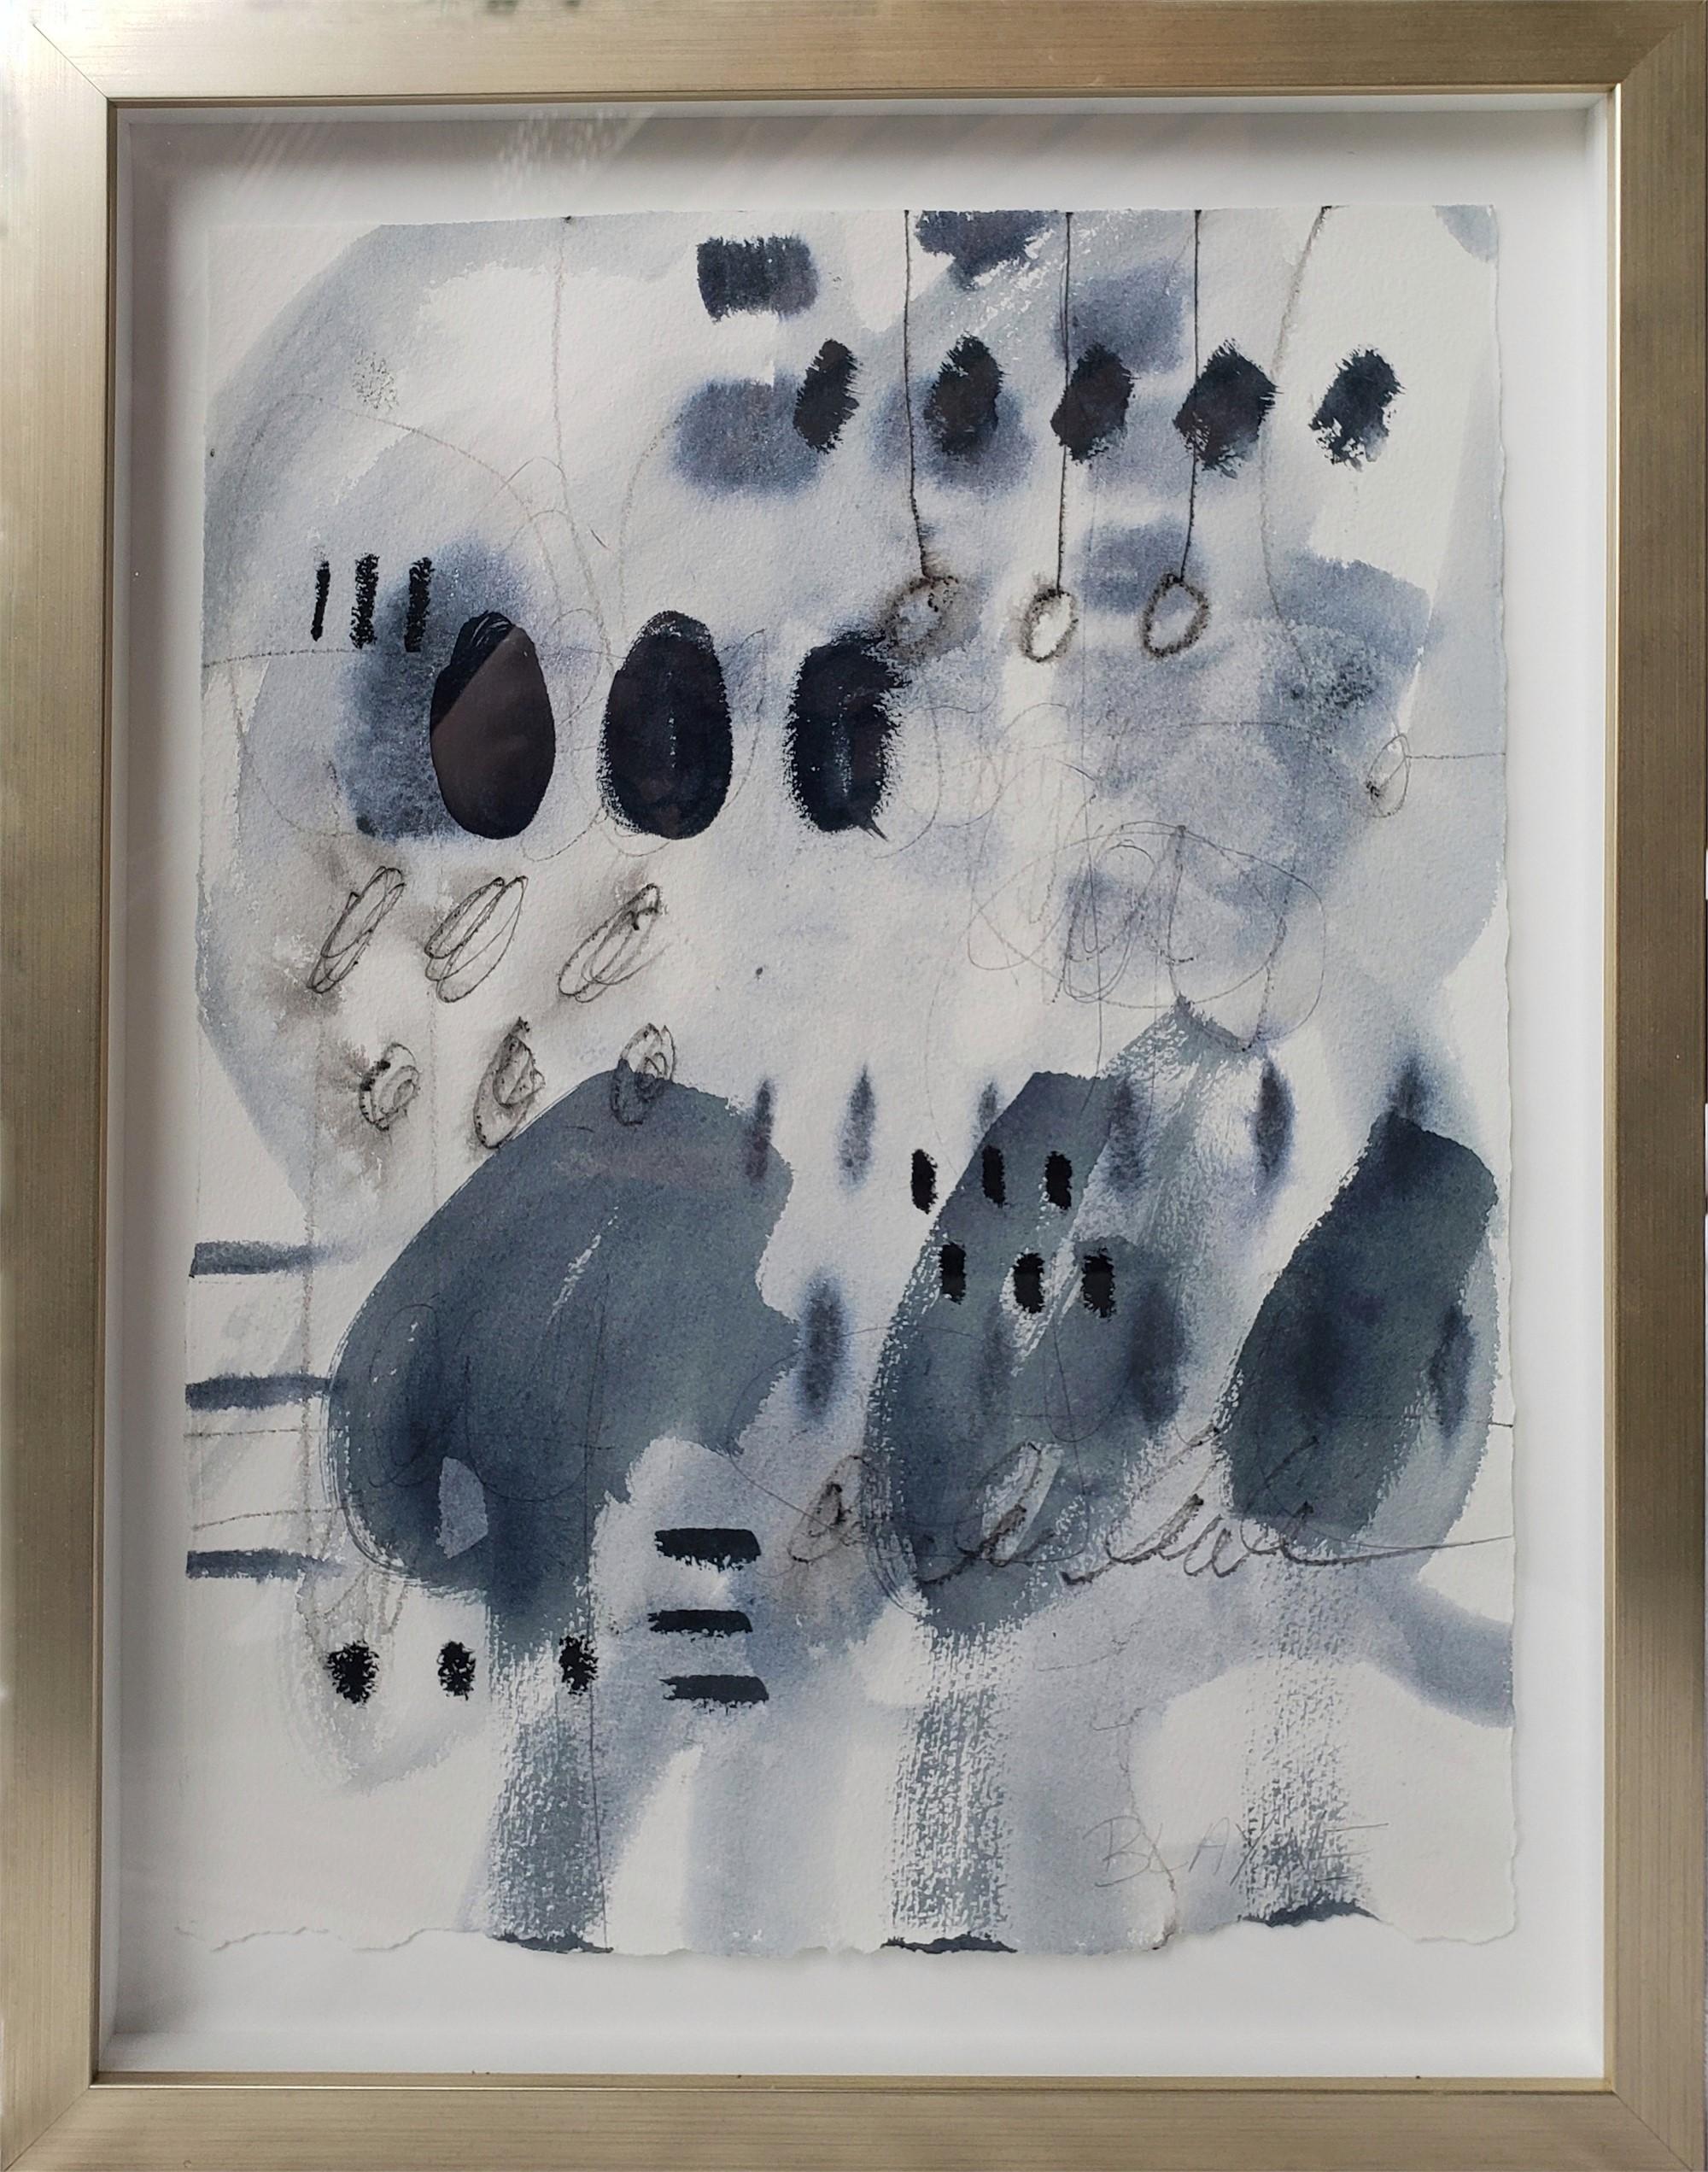 Blueprint #1 by Blayne Macauley